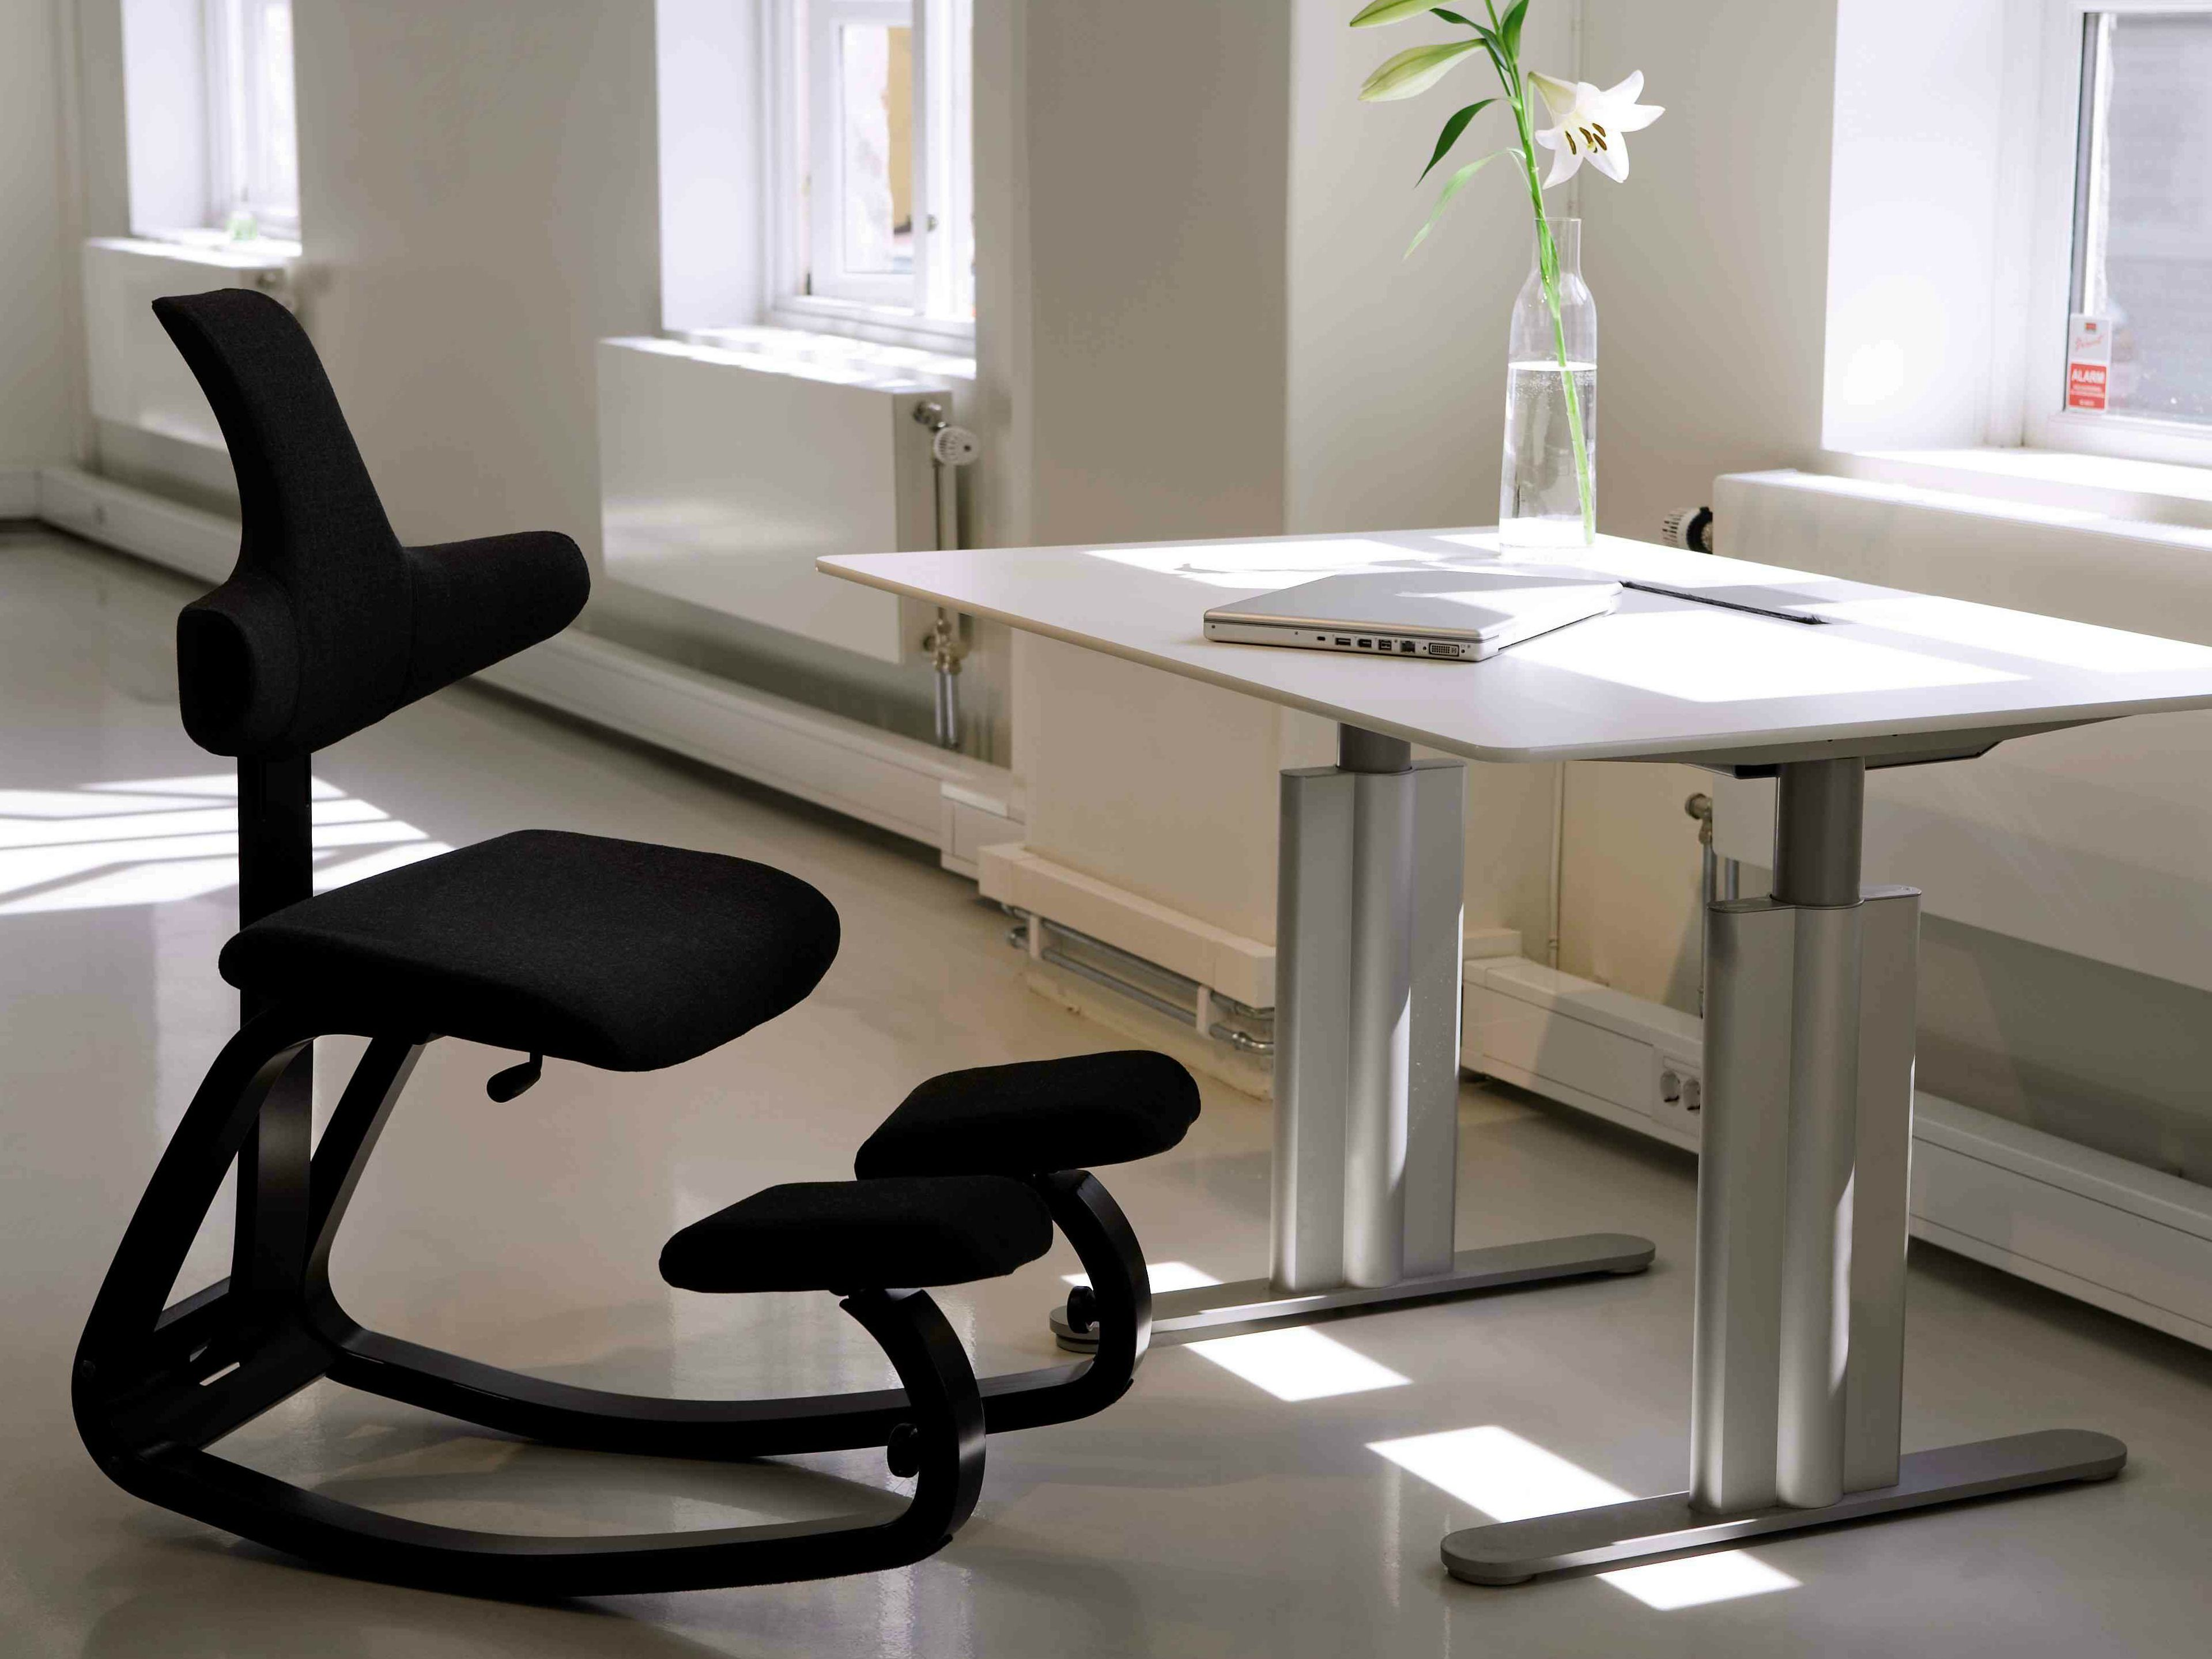 Sedia a dondolo ergonomica THATSIT™ BALANS® by Varier ...